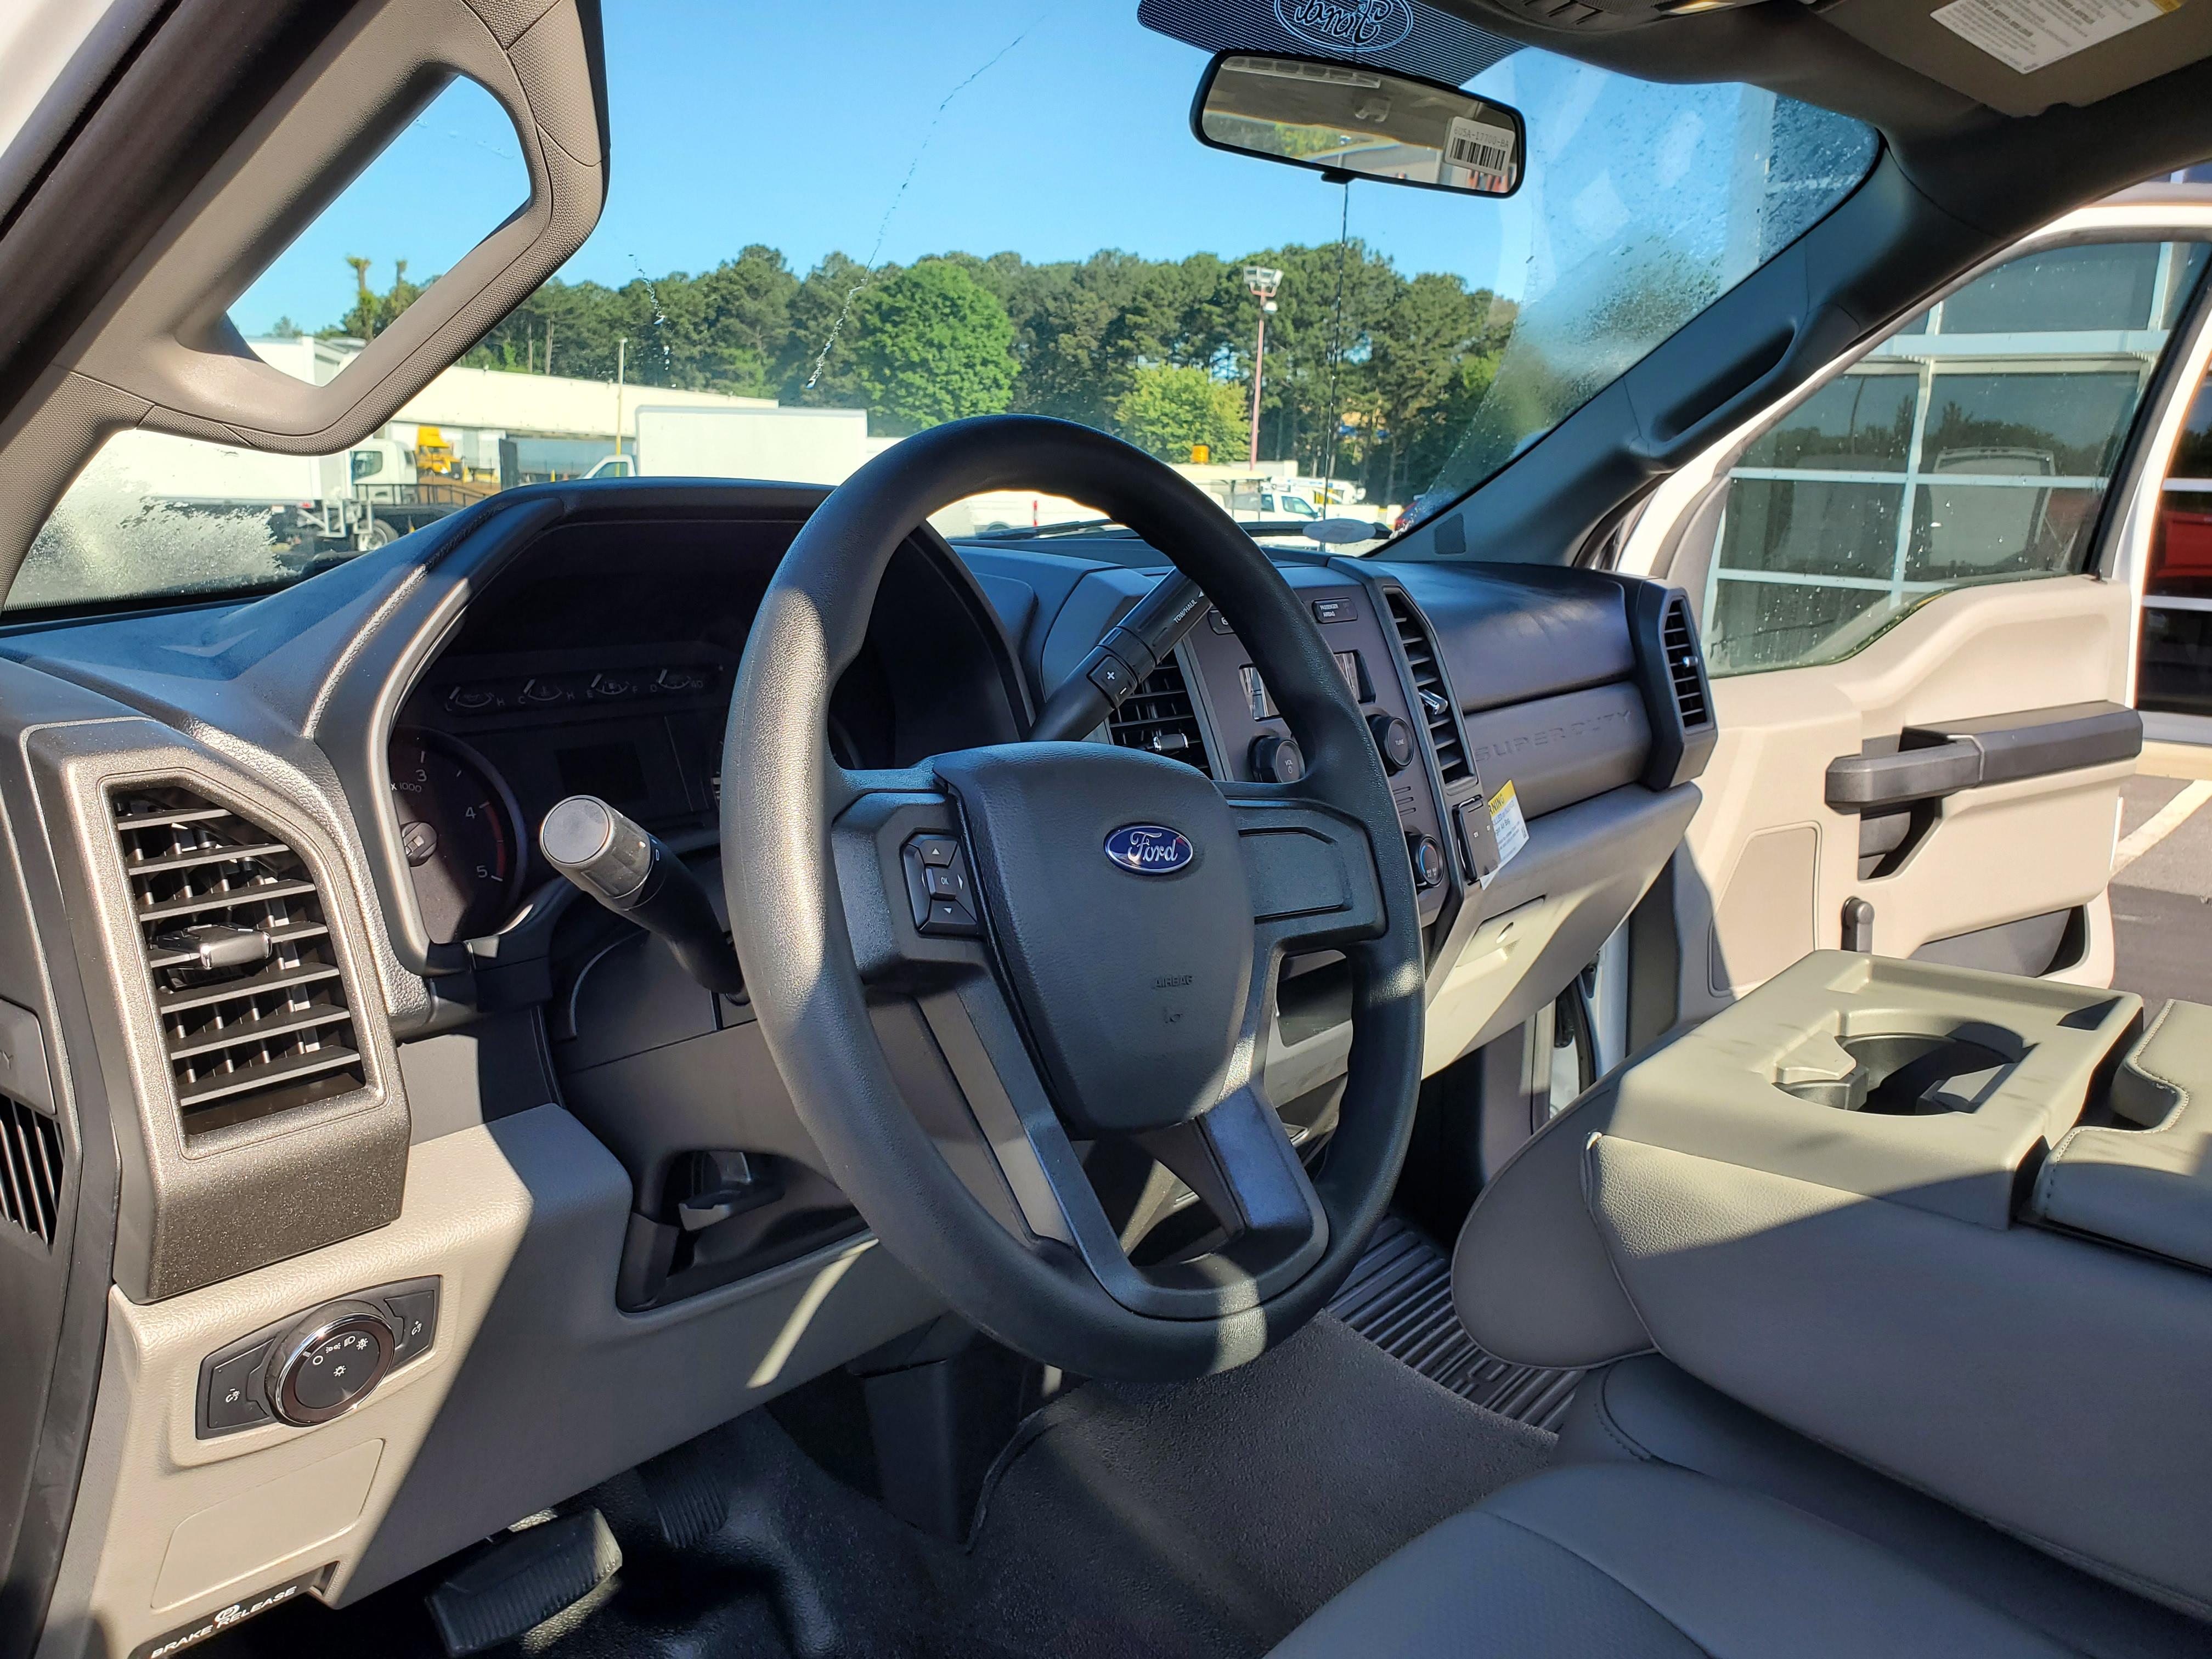 2019 Ford F-450 Regular Cab DRW 4x2, Cab Chassis #KDA23950 - photo 6